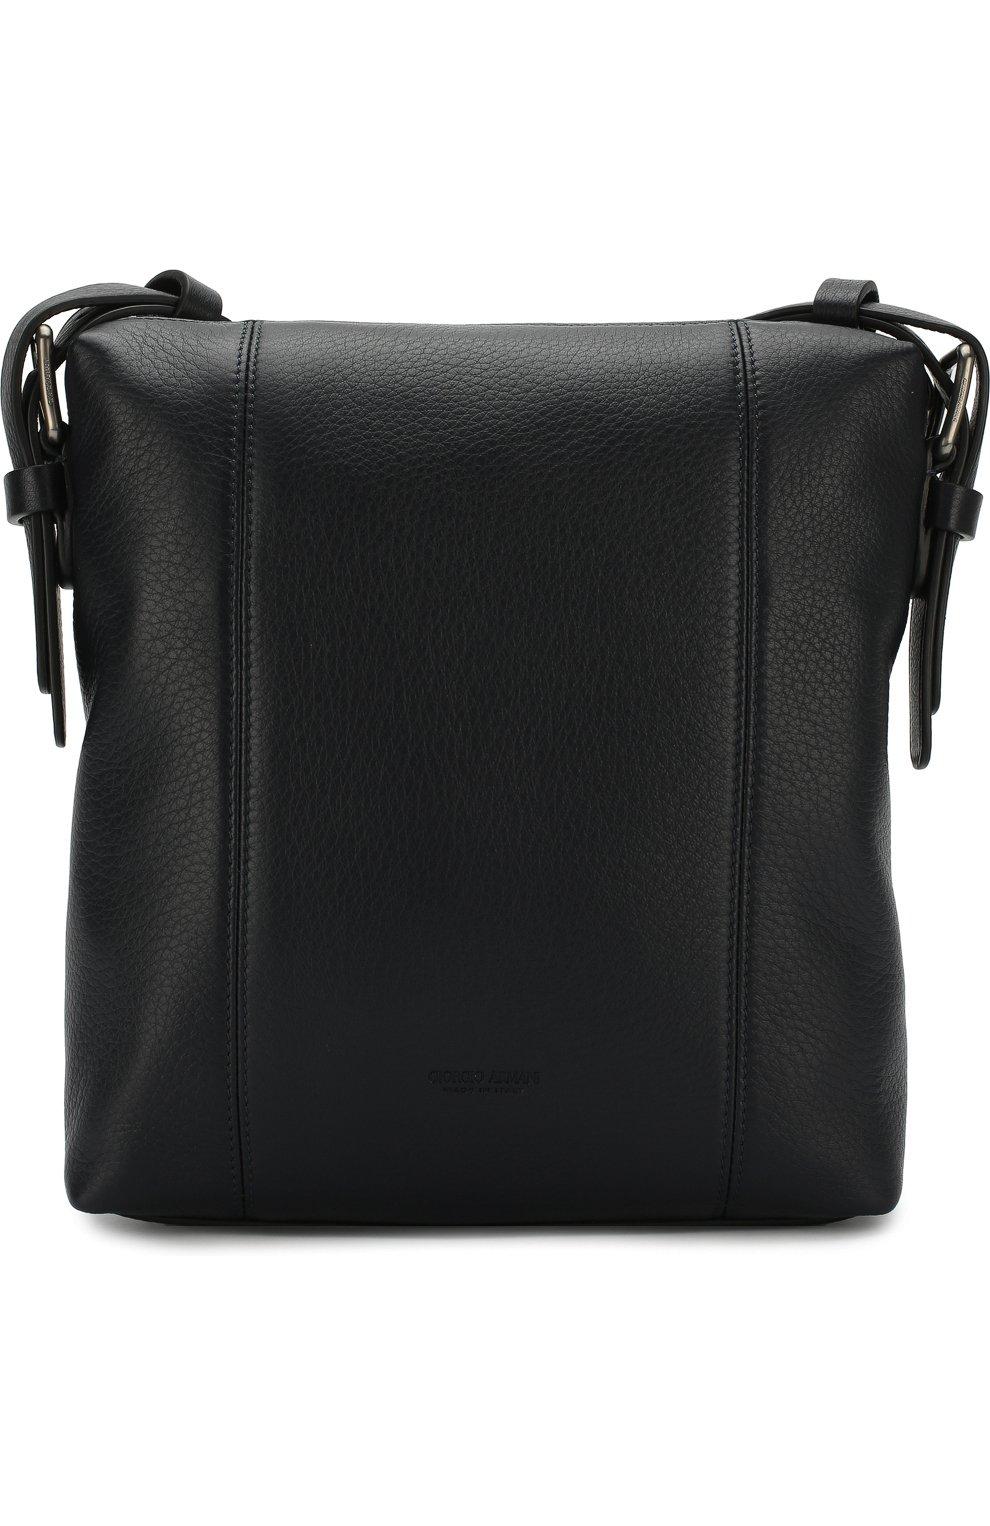 6dcd24a47cd3 Мужская темно-синяя кожаная сумка-планшет GIORGIO ARMANI — купить за ...